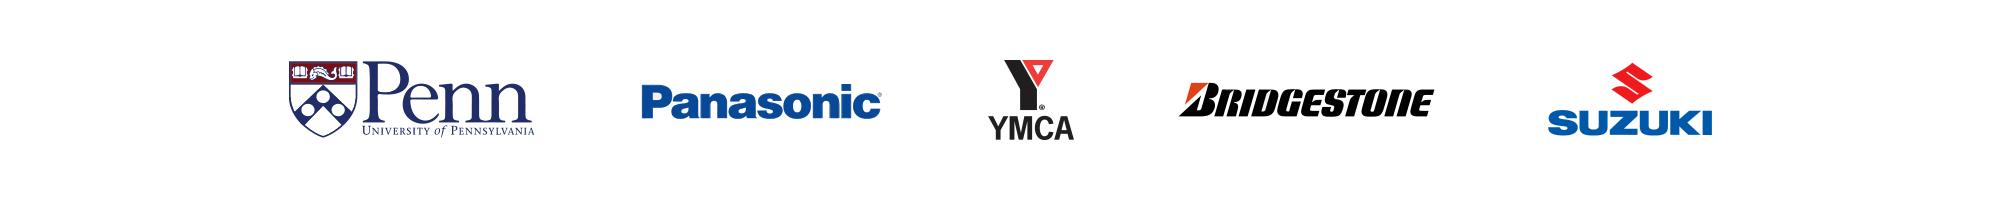 client-logo-strip